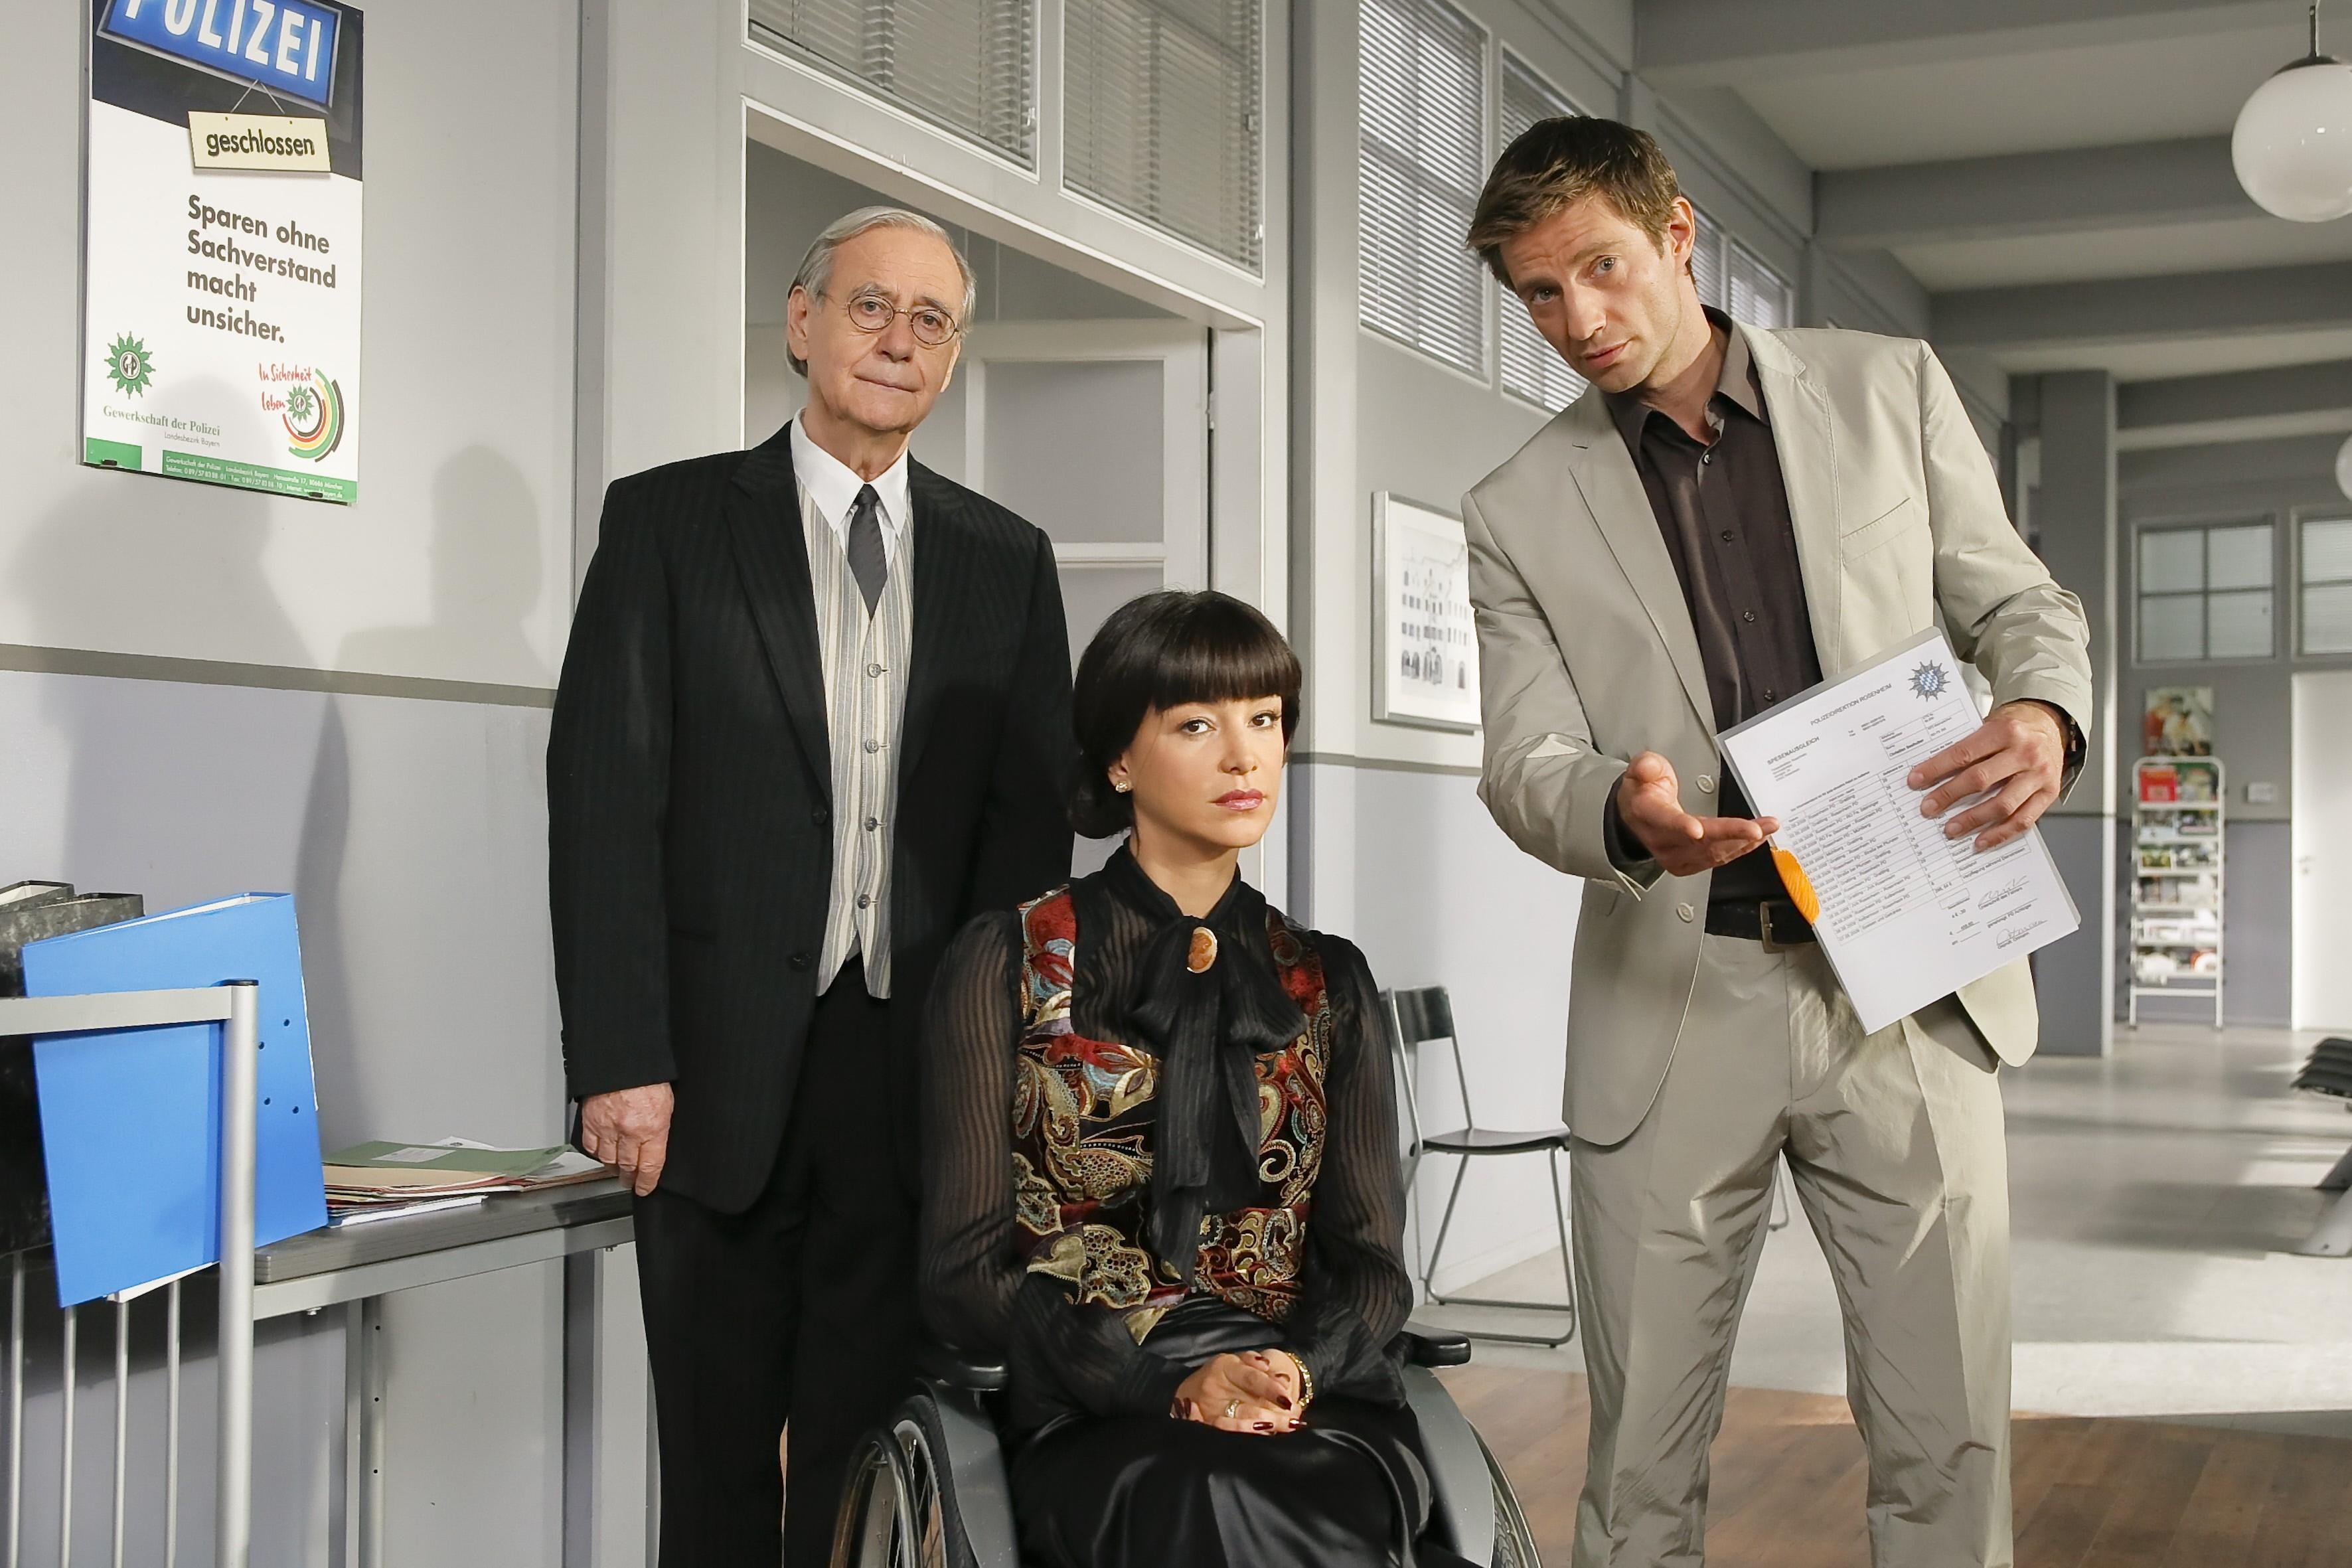 Wilfried Klaus, Verona Pooth und Igor Jeftic